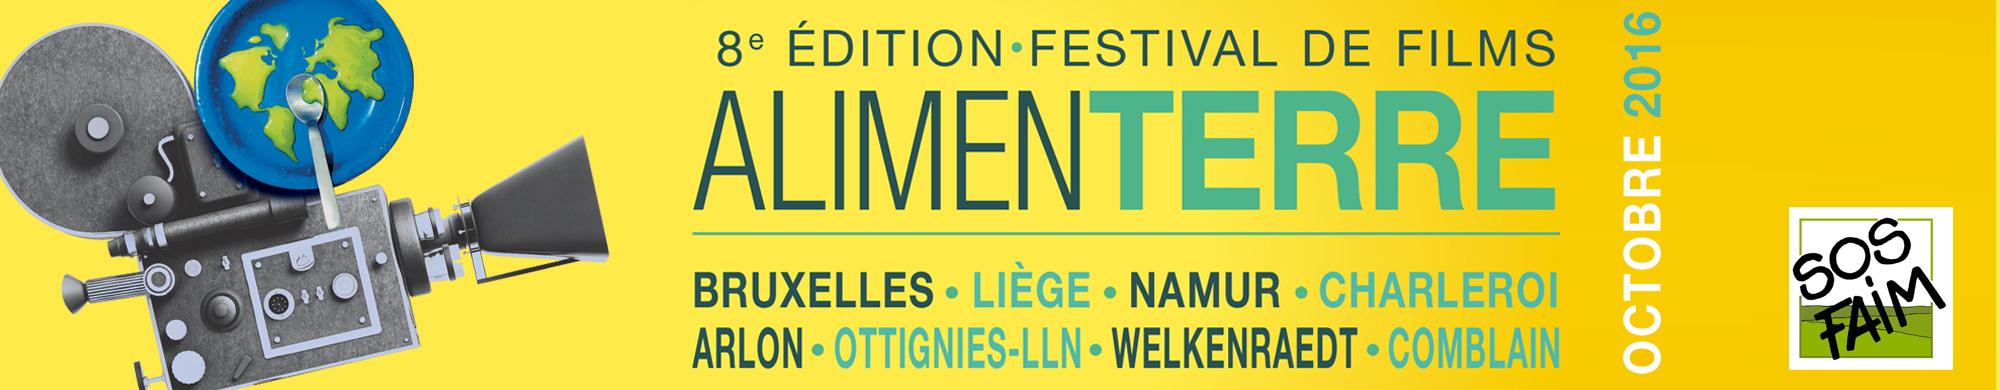 Le Festival AlimenTERRE 2016